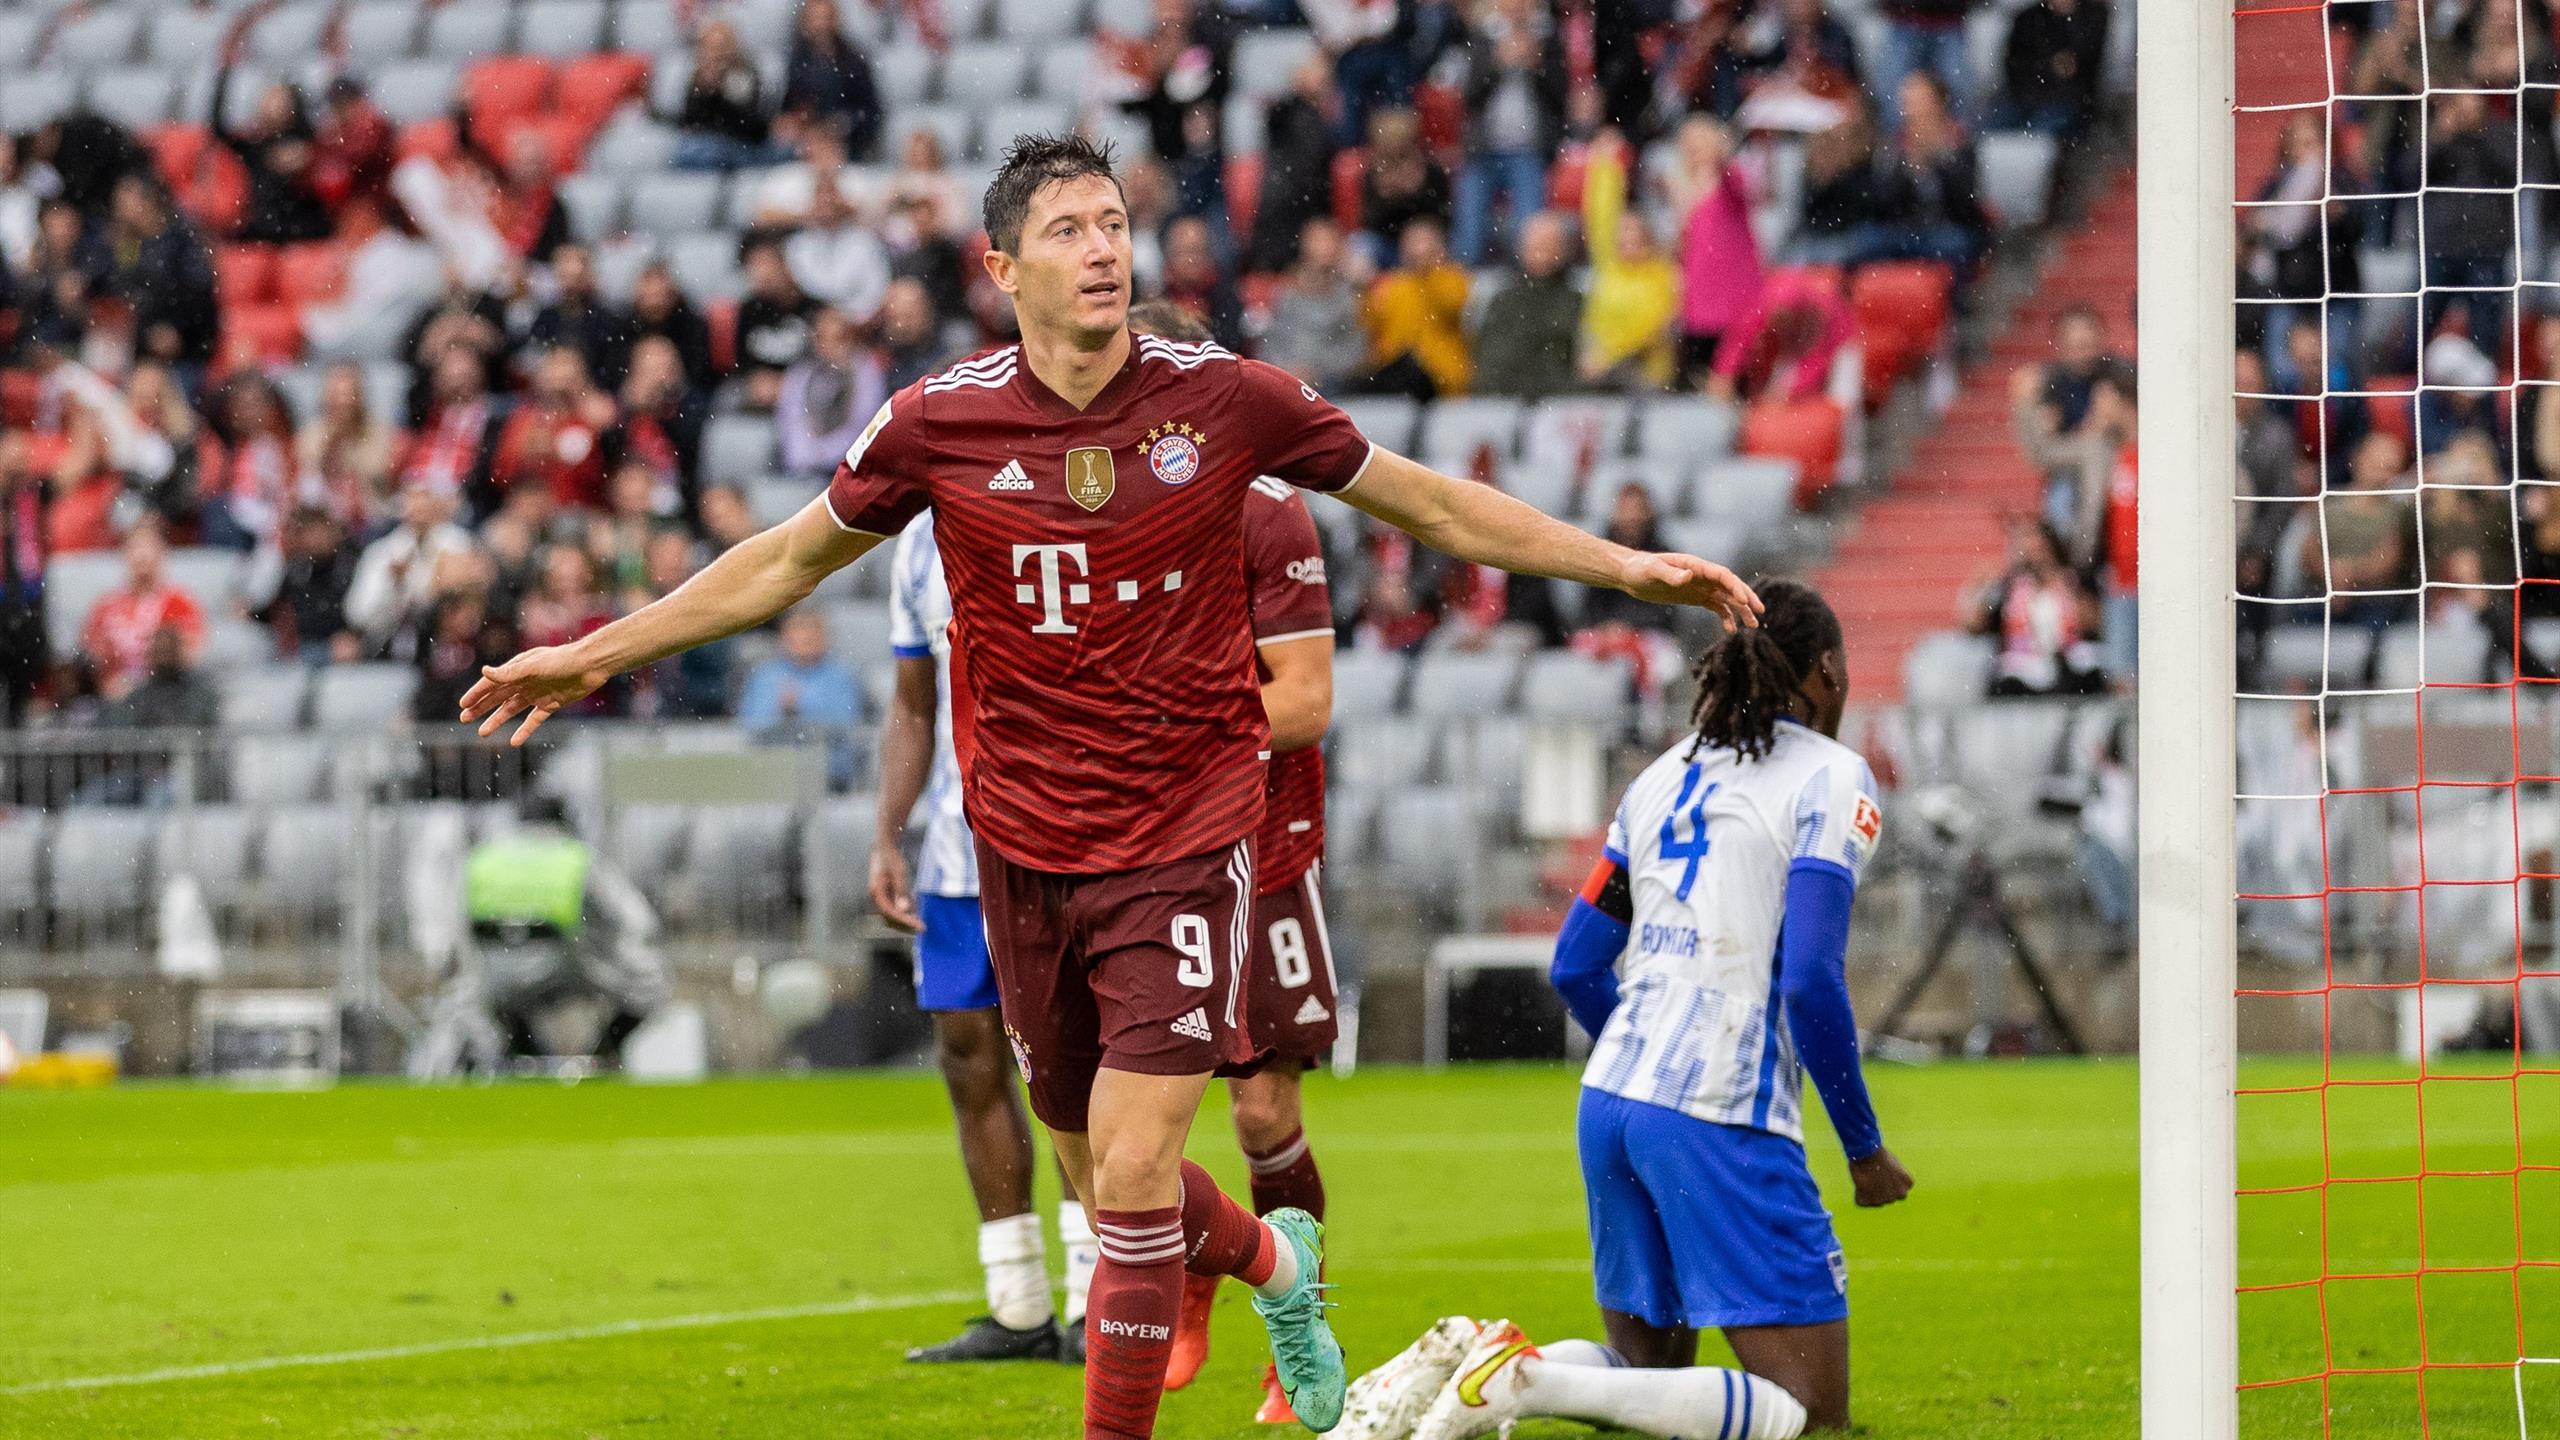 Bundesliga: Bayern Munich Defeat Hertha Berlin 5-0